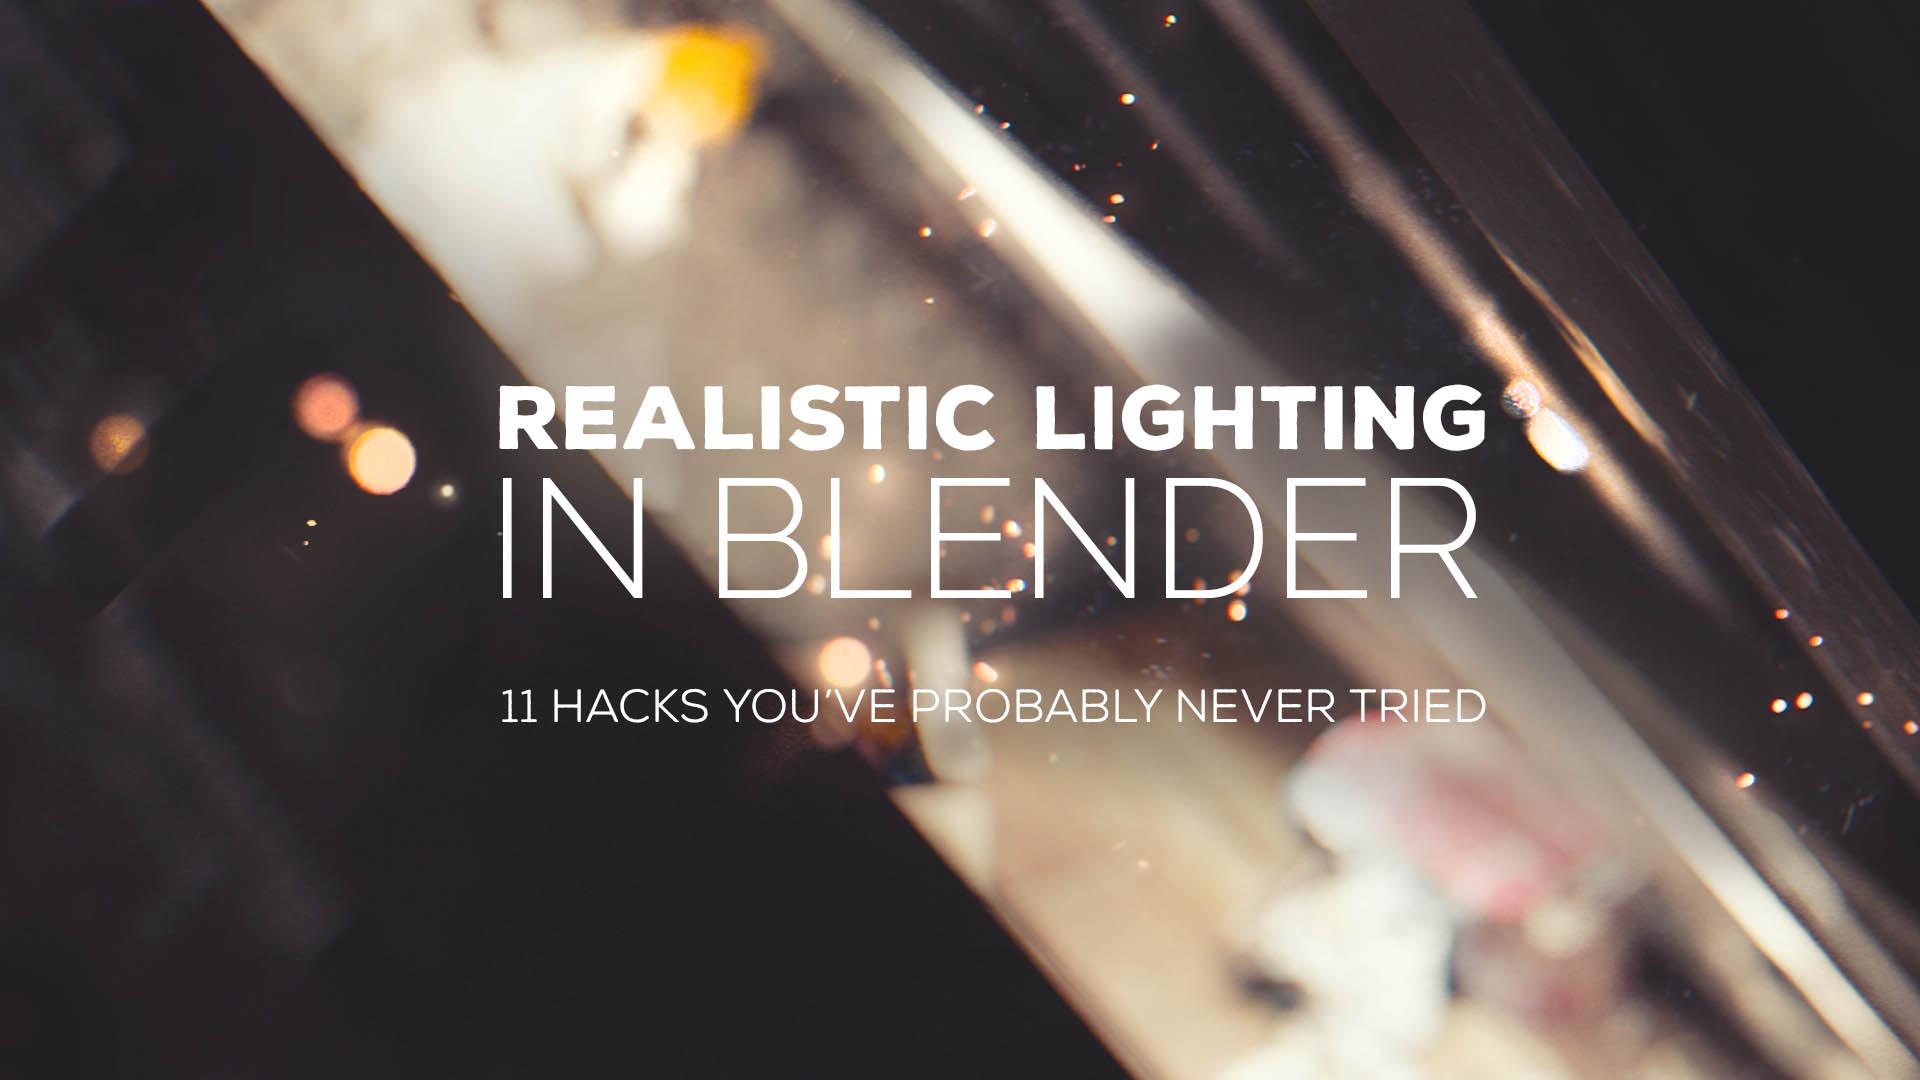 Realistic Lighting in Blender: 11 Hacks You've Probably Never Tried